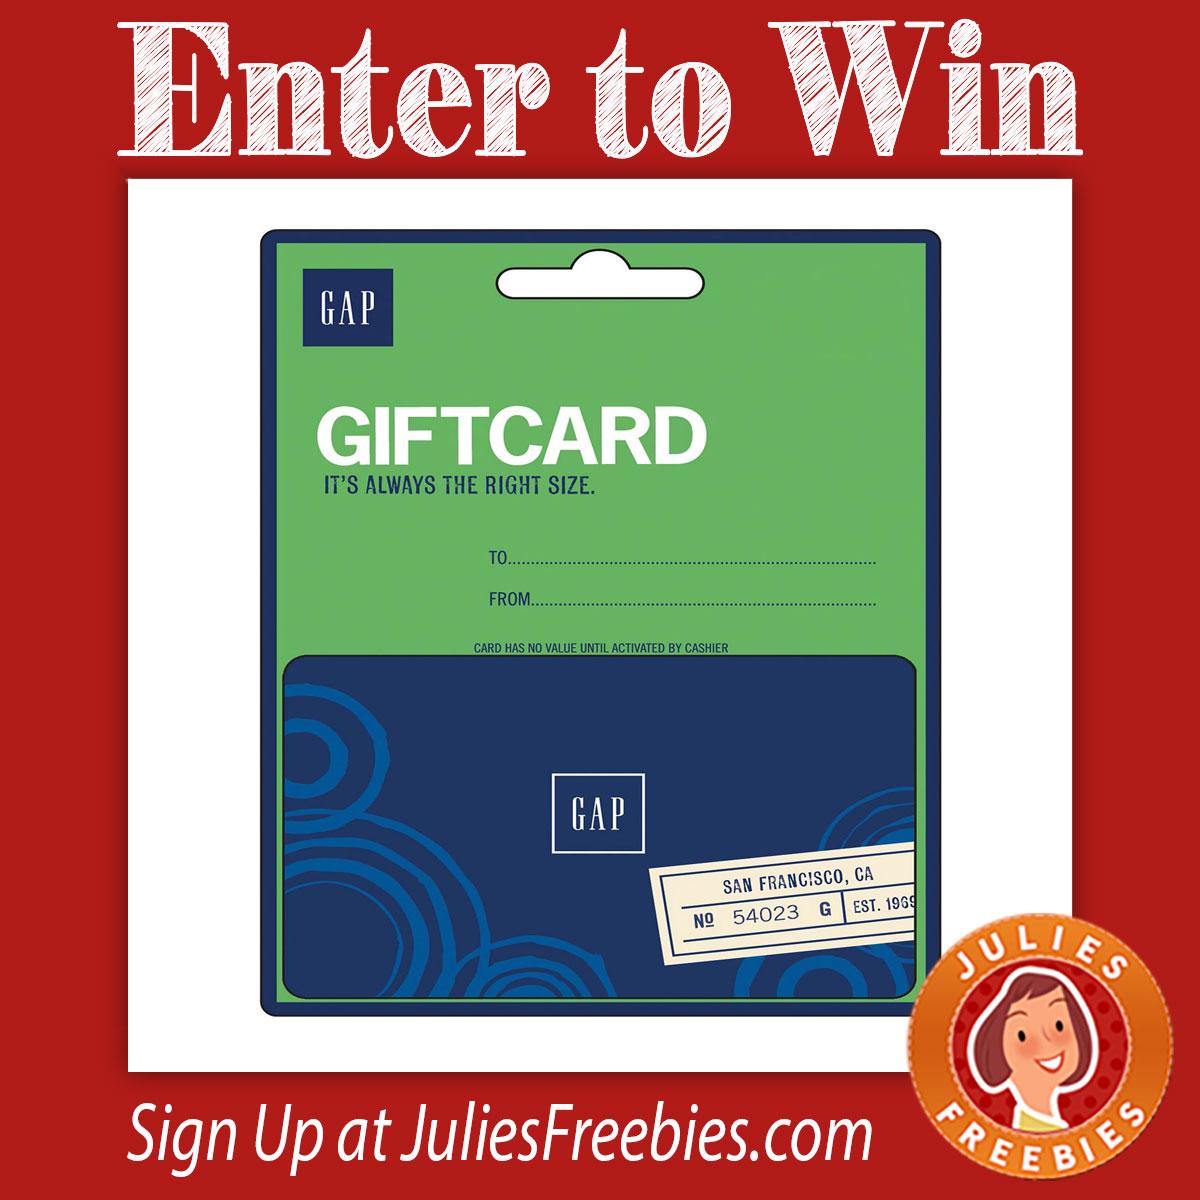 Win a Gap Gift Card - Julie's Freebies